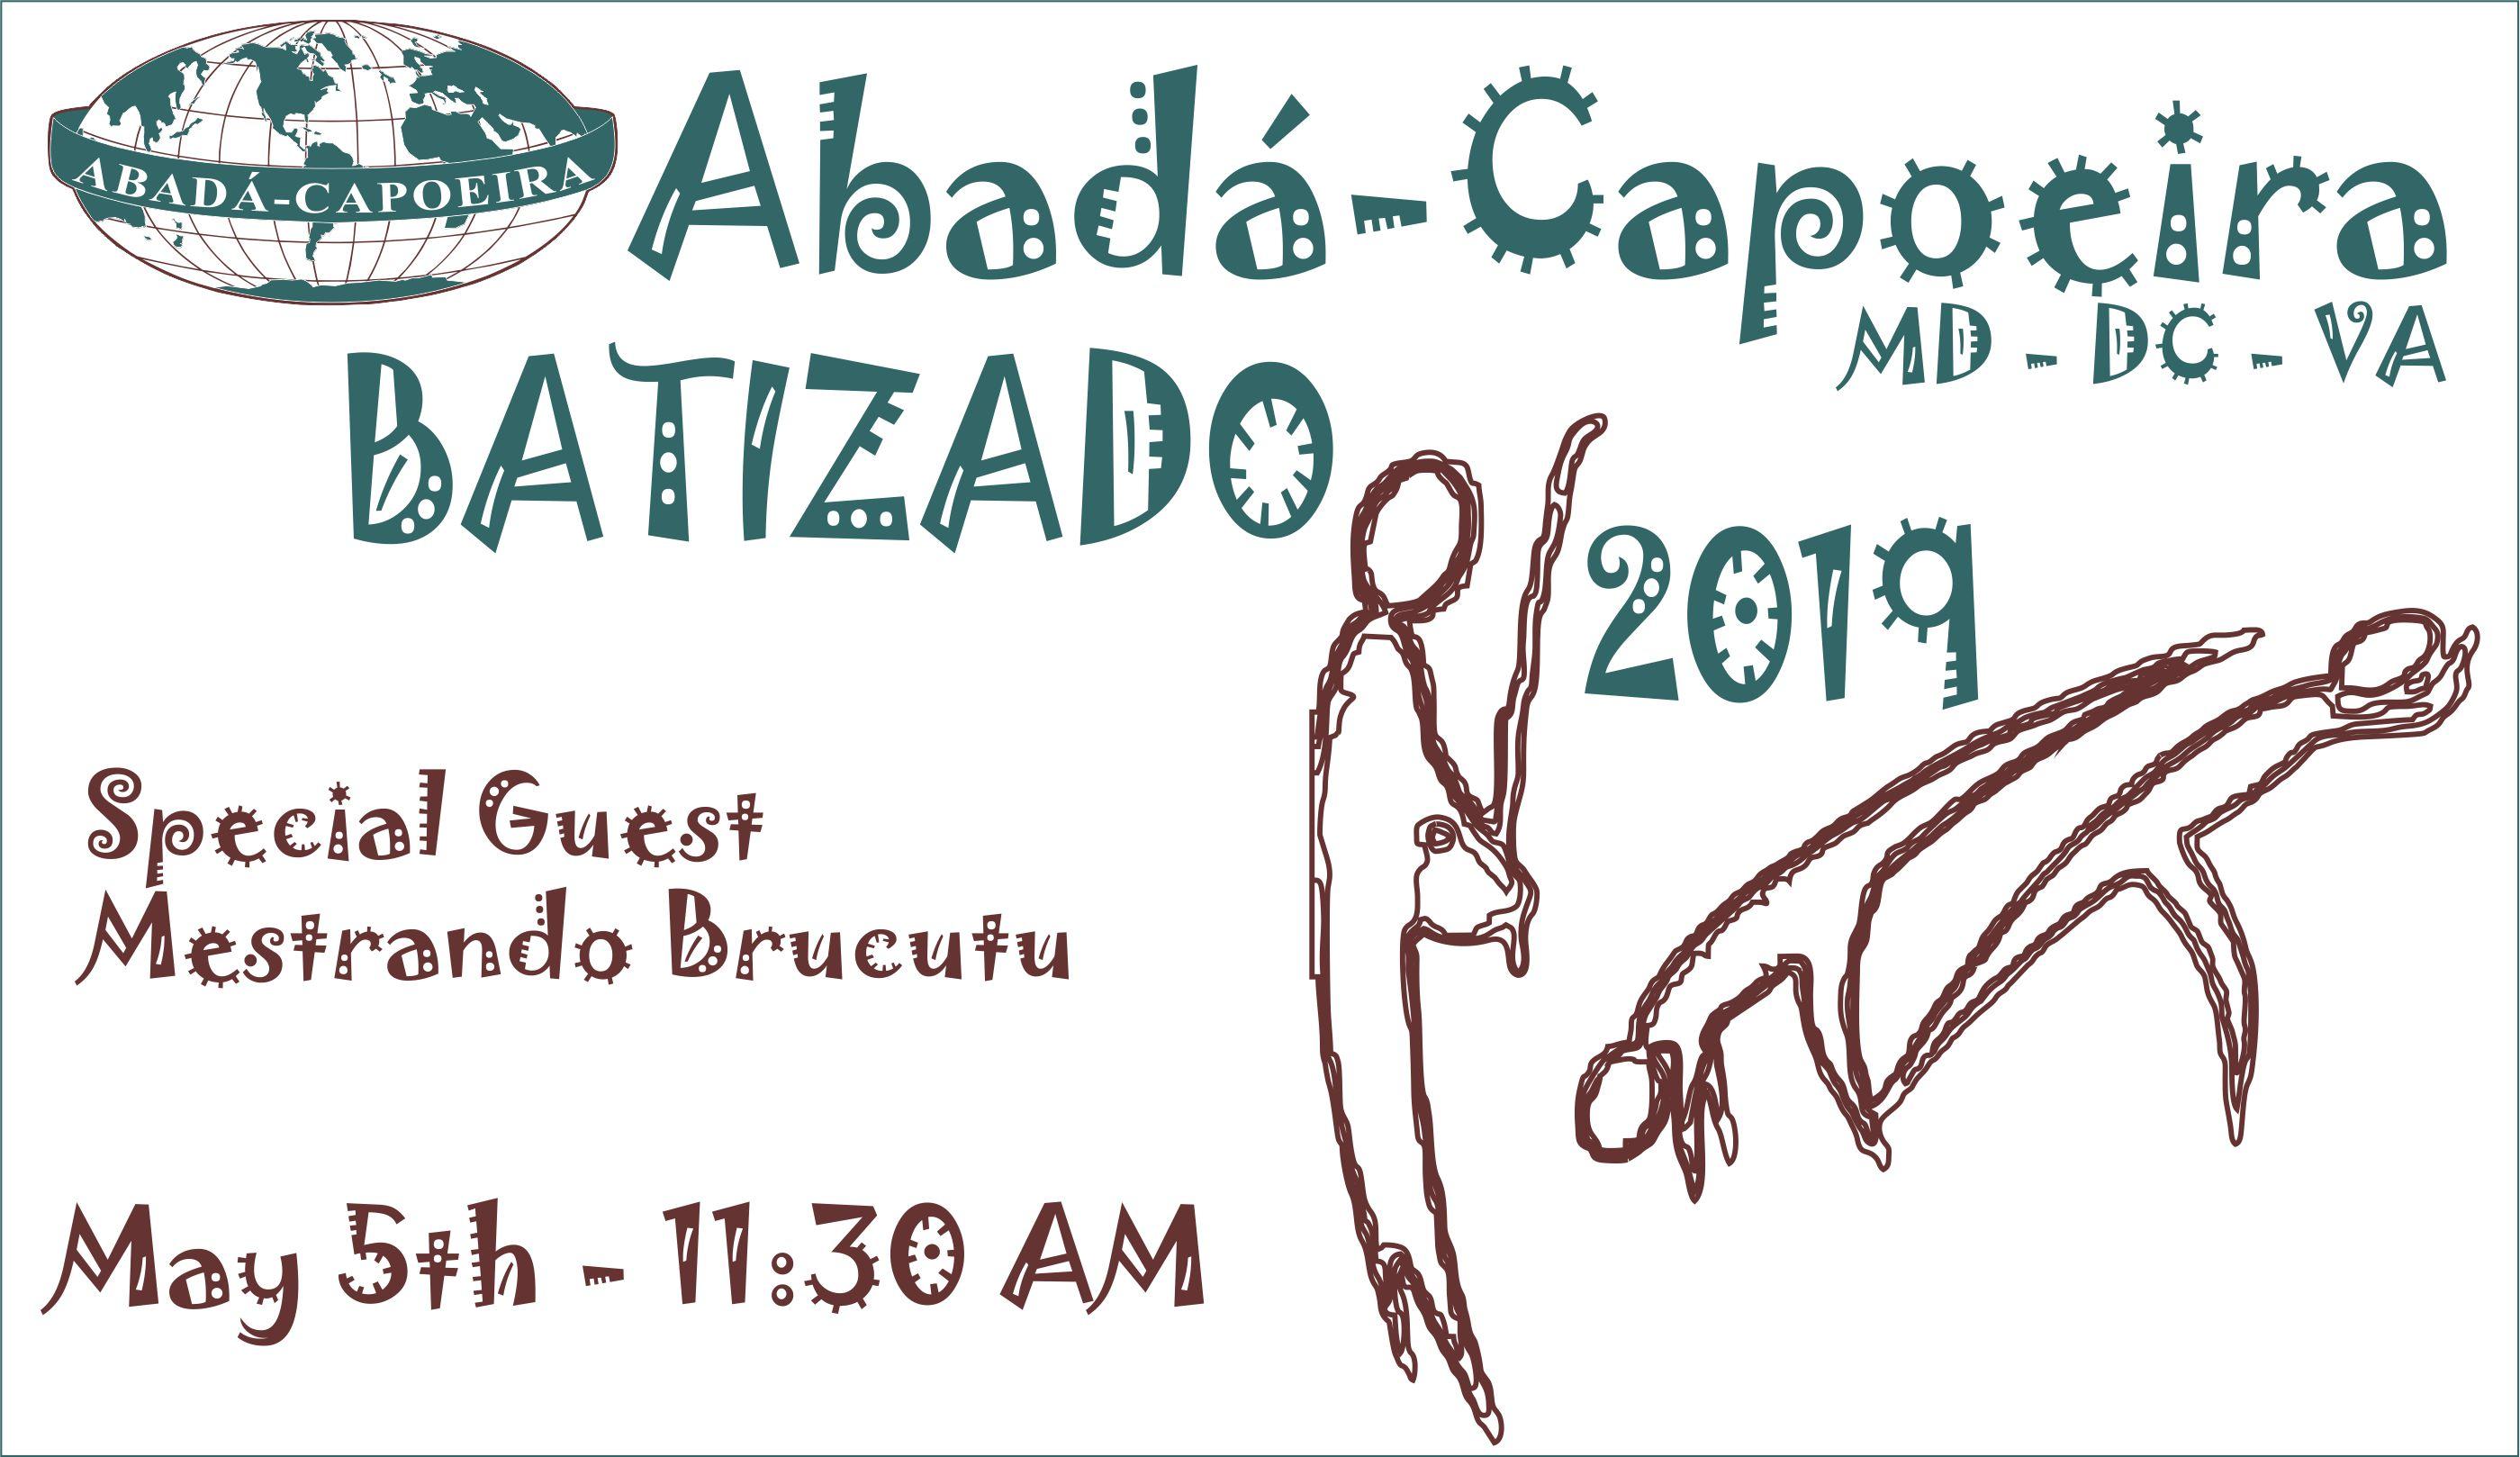 Welcome to Abada-Capoeira DC